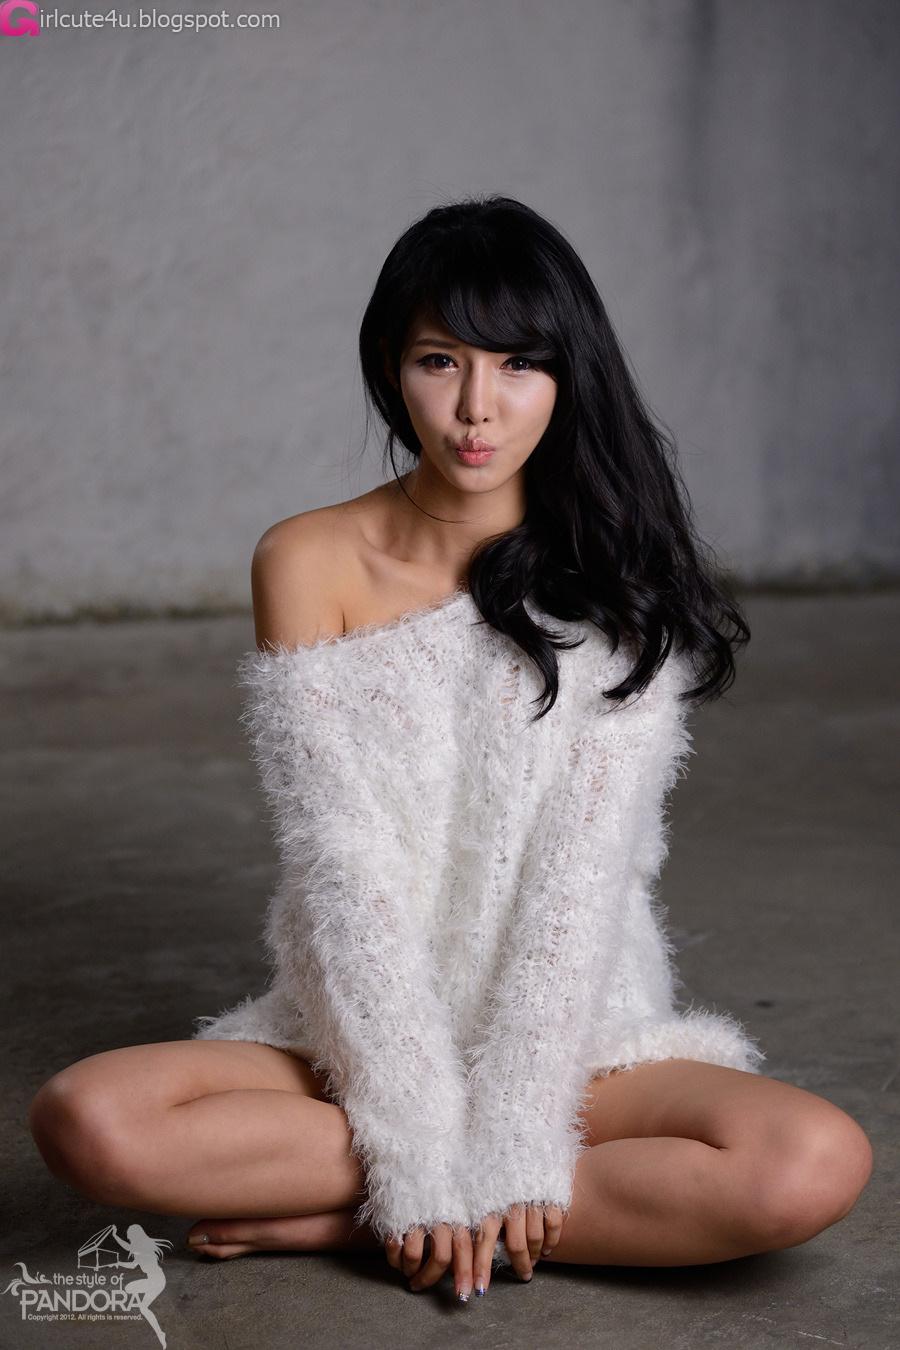 xxx nude girls: Sexy Cha Sun Hwa